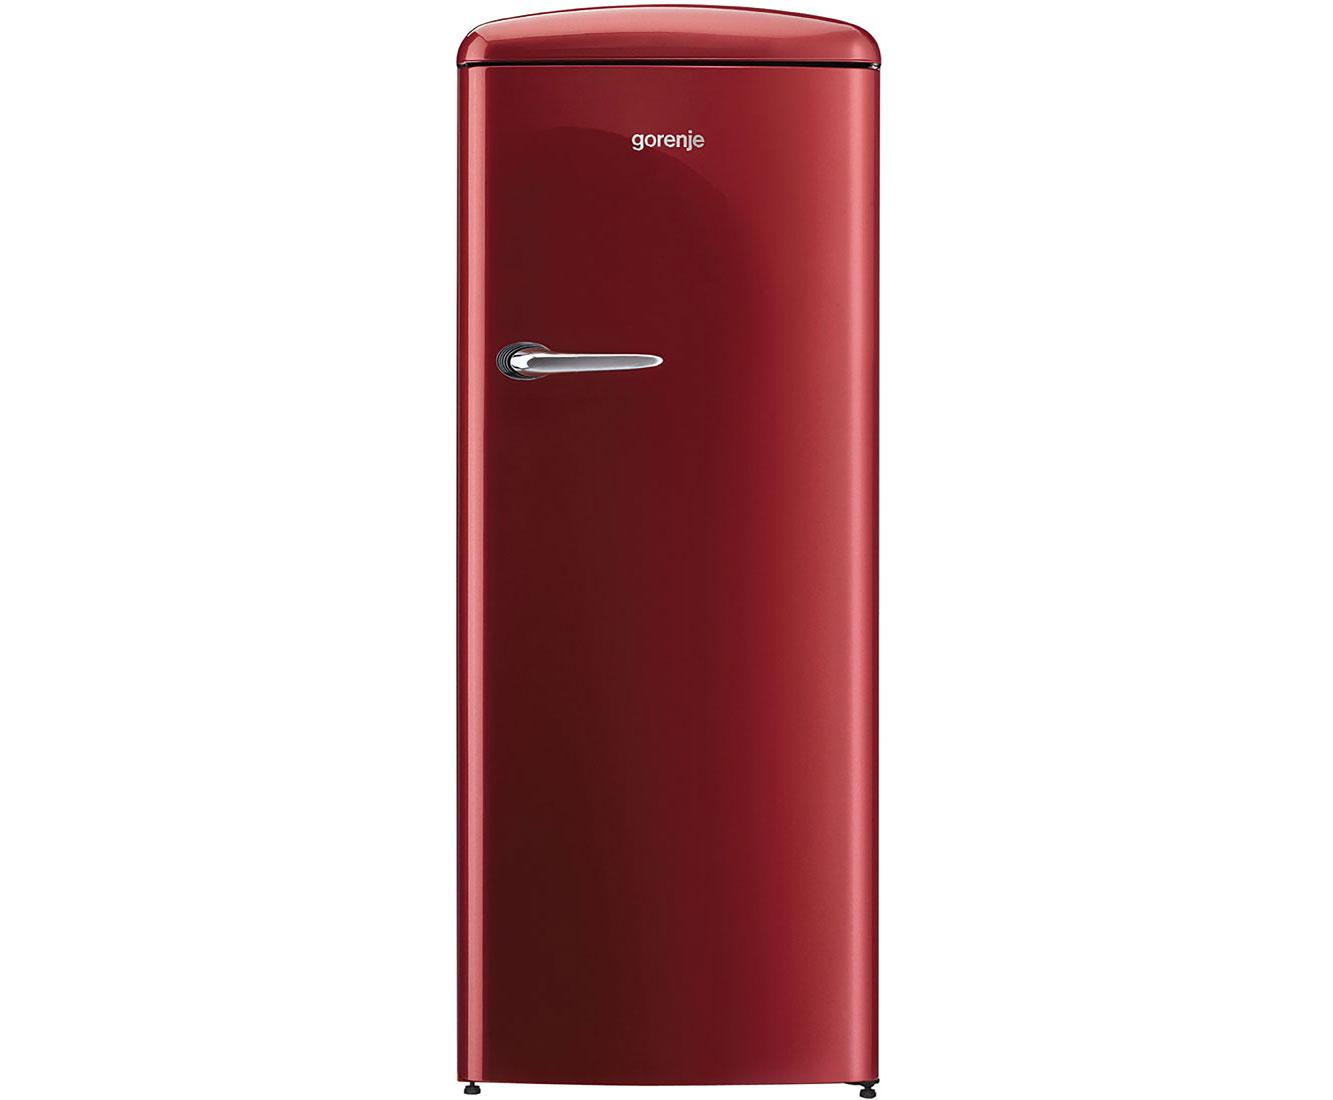 Amerikanischer Kühlschrank Retro Smeg : Amerikanische retro kühlschränke retro kühlschrank usa gorenje